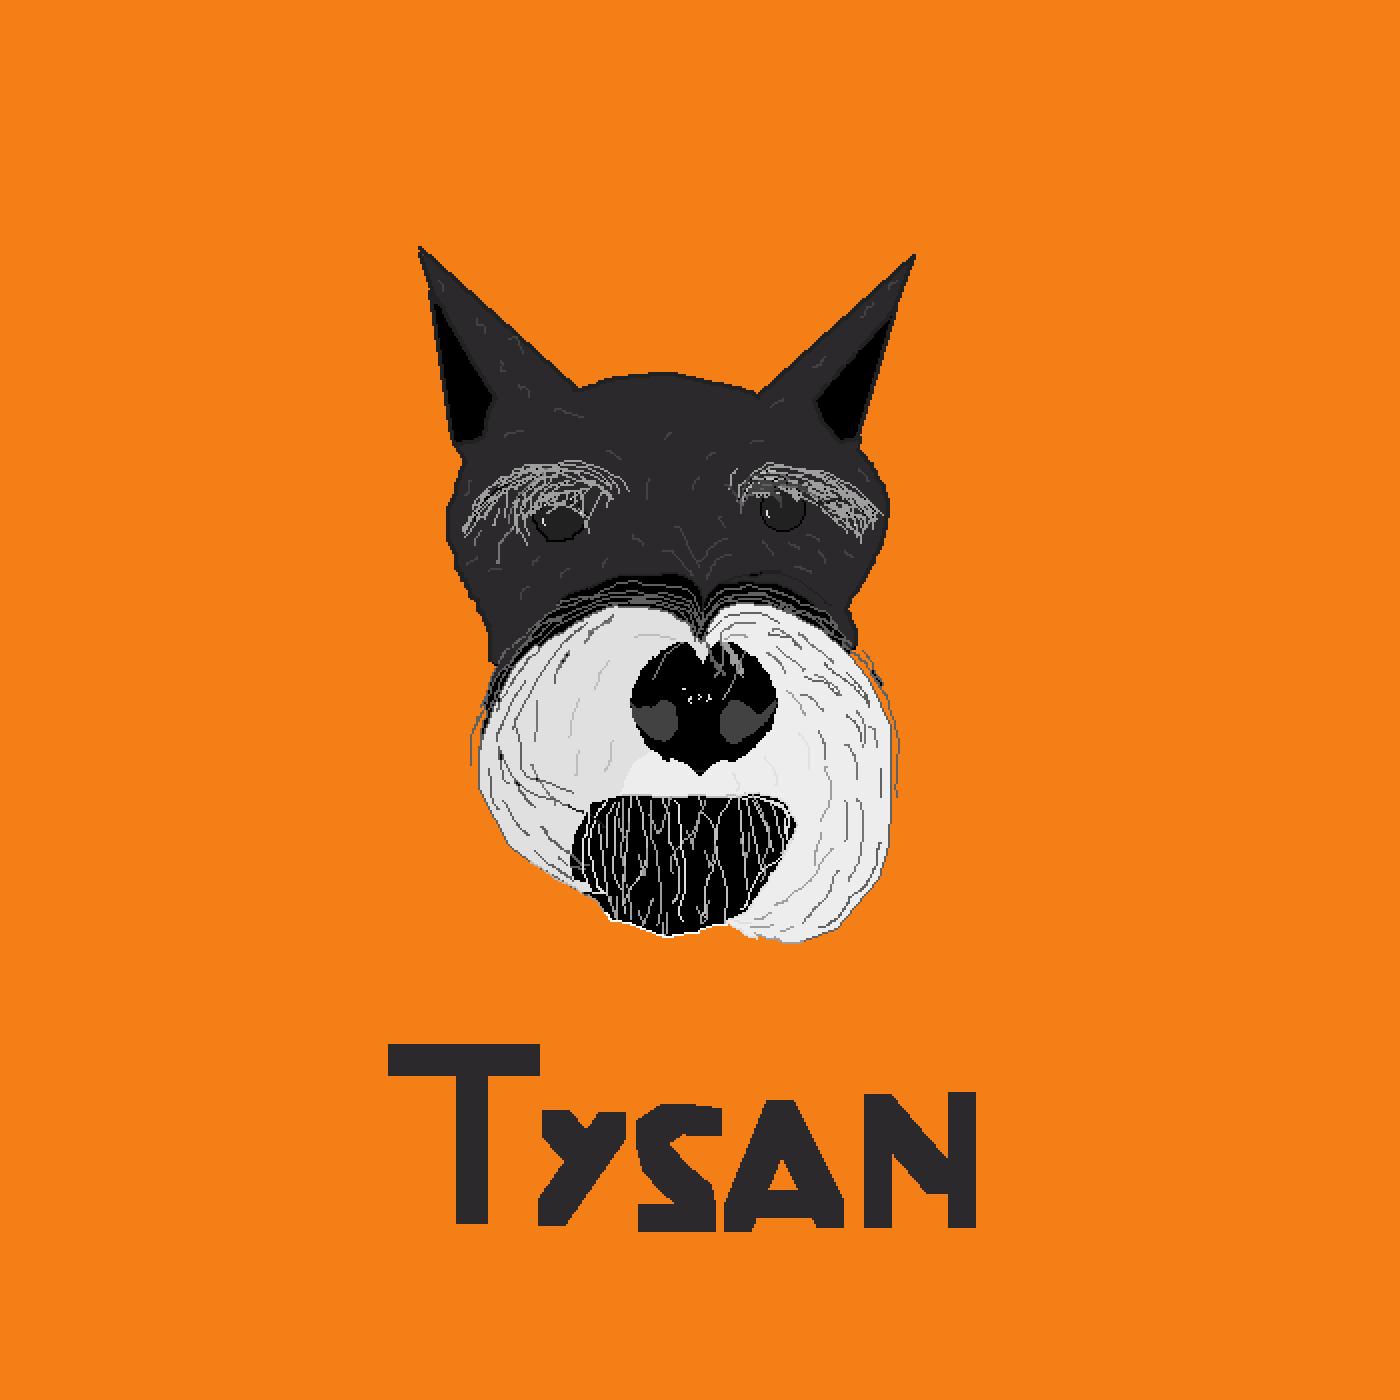 My Dog, Tysan by Pixel-OOF